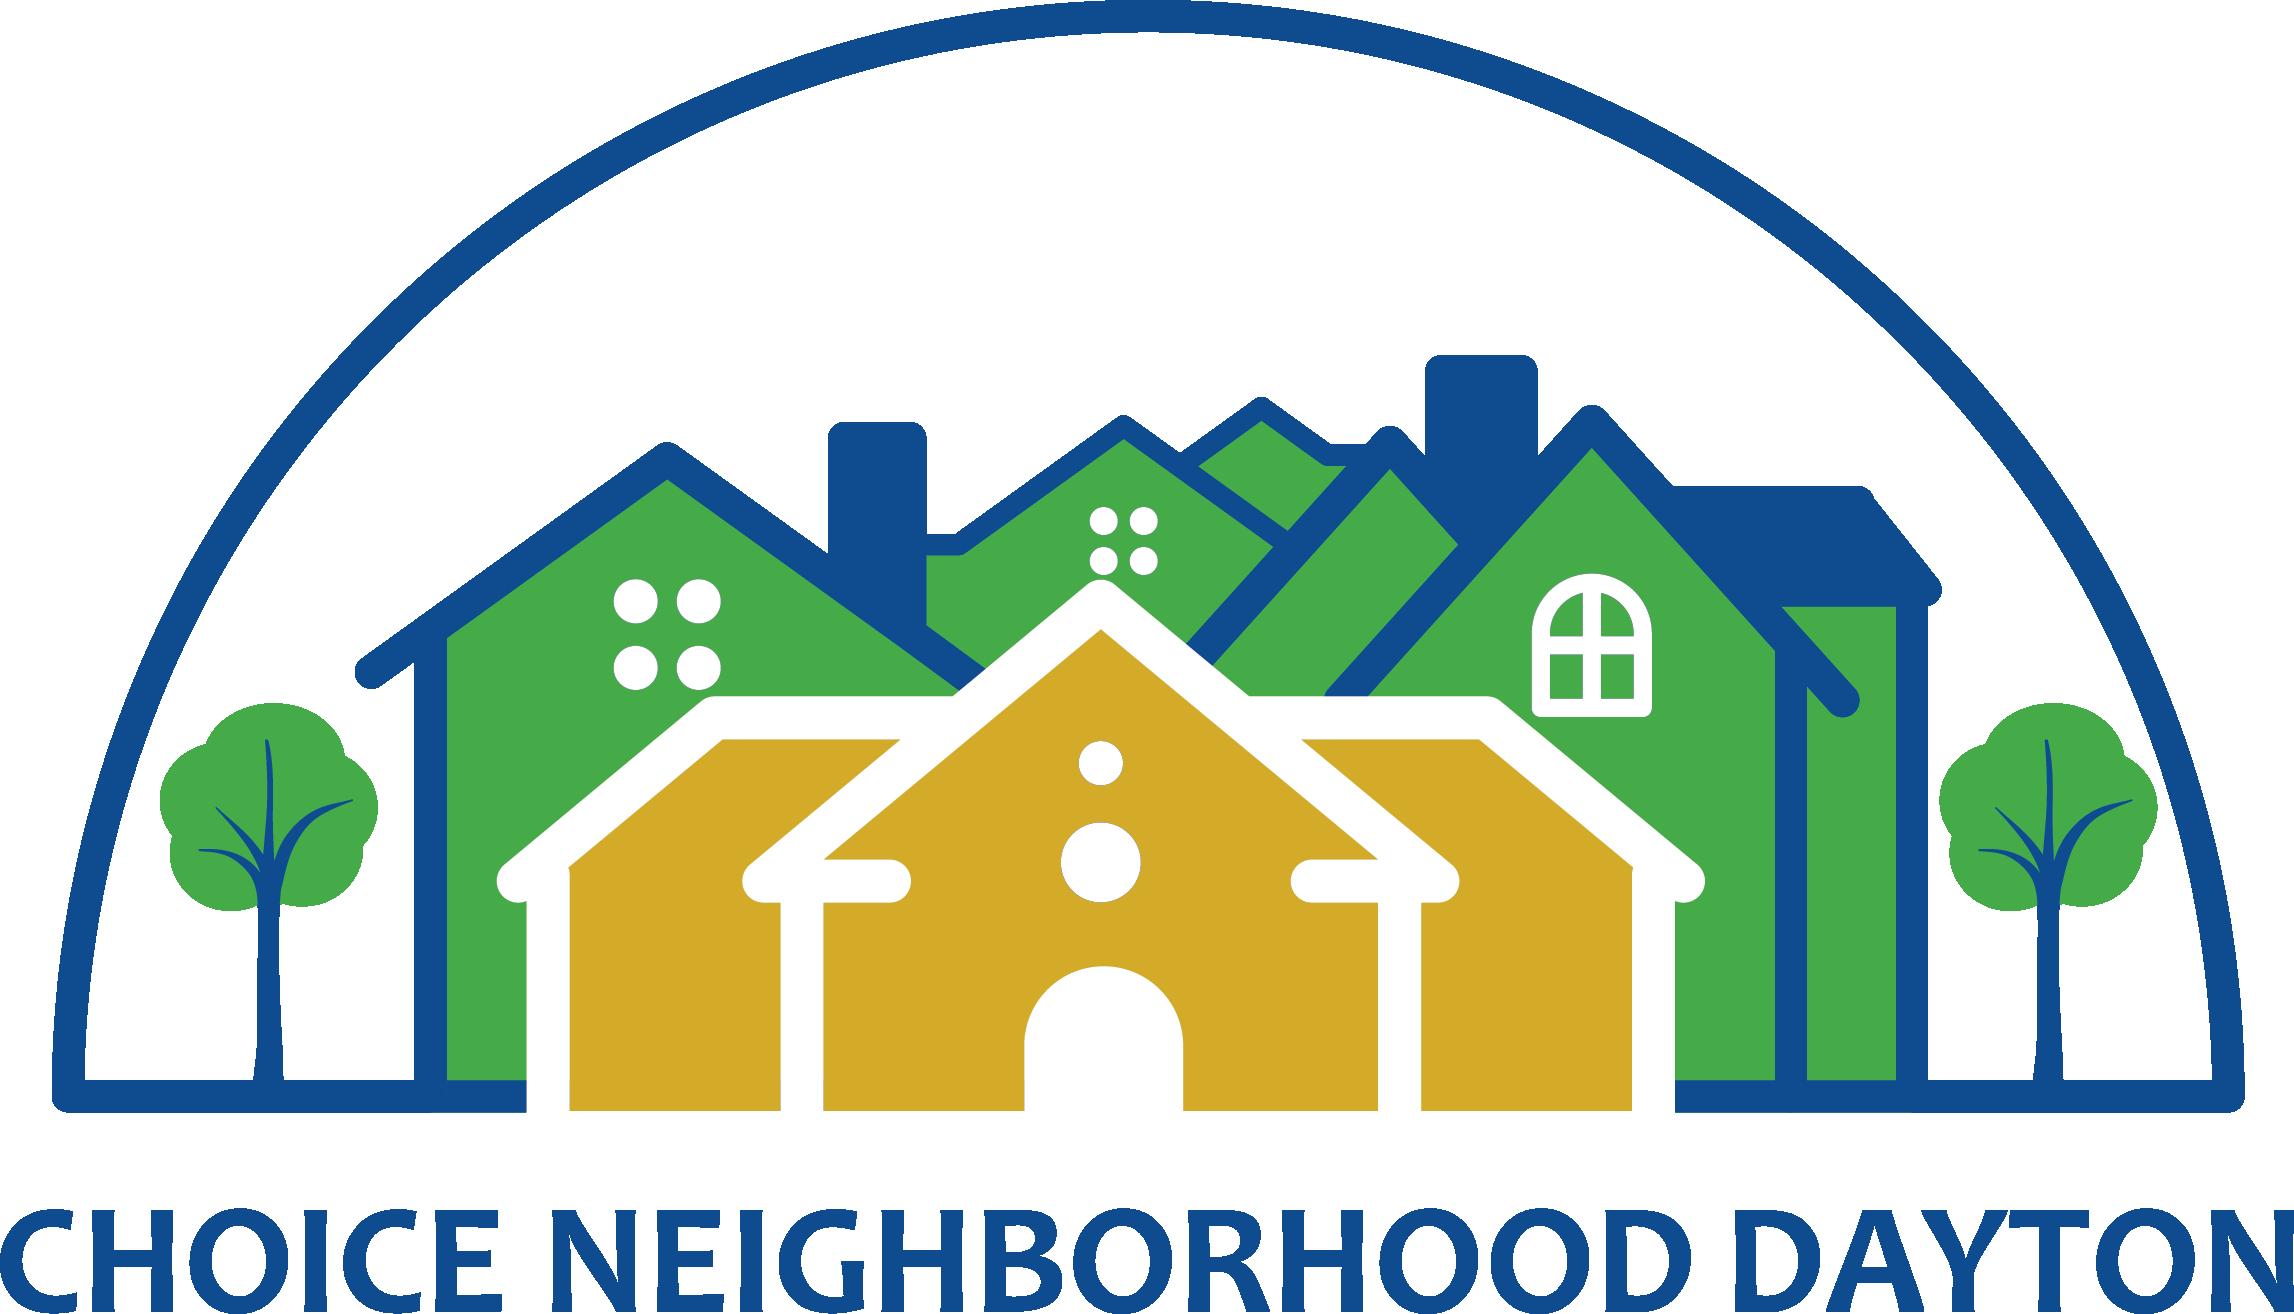 Neighborhood clipart housing estate. About dayton metropolitan